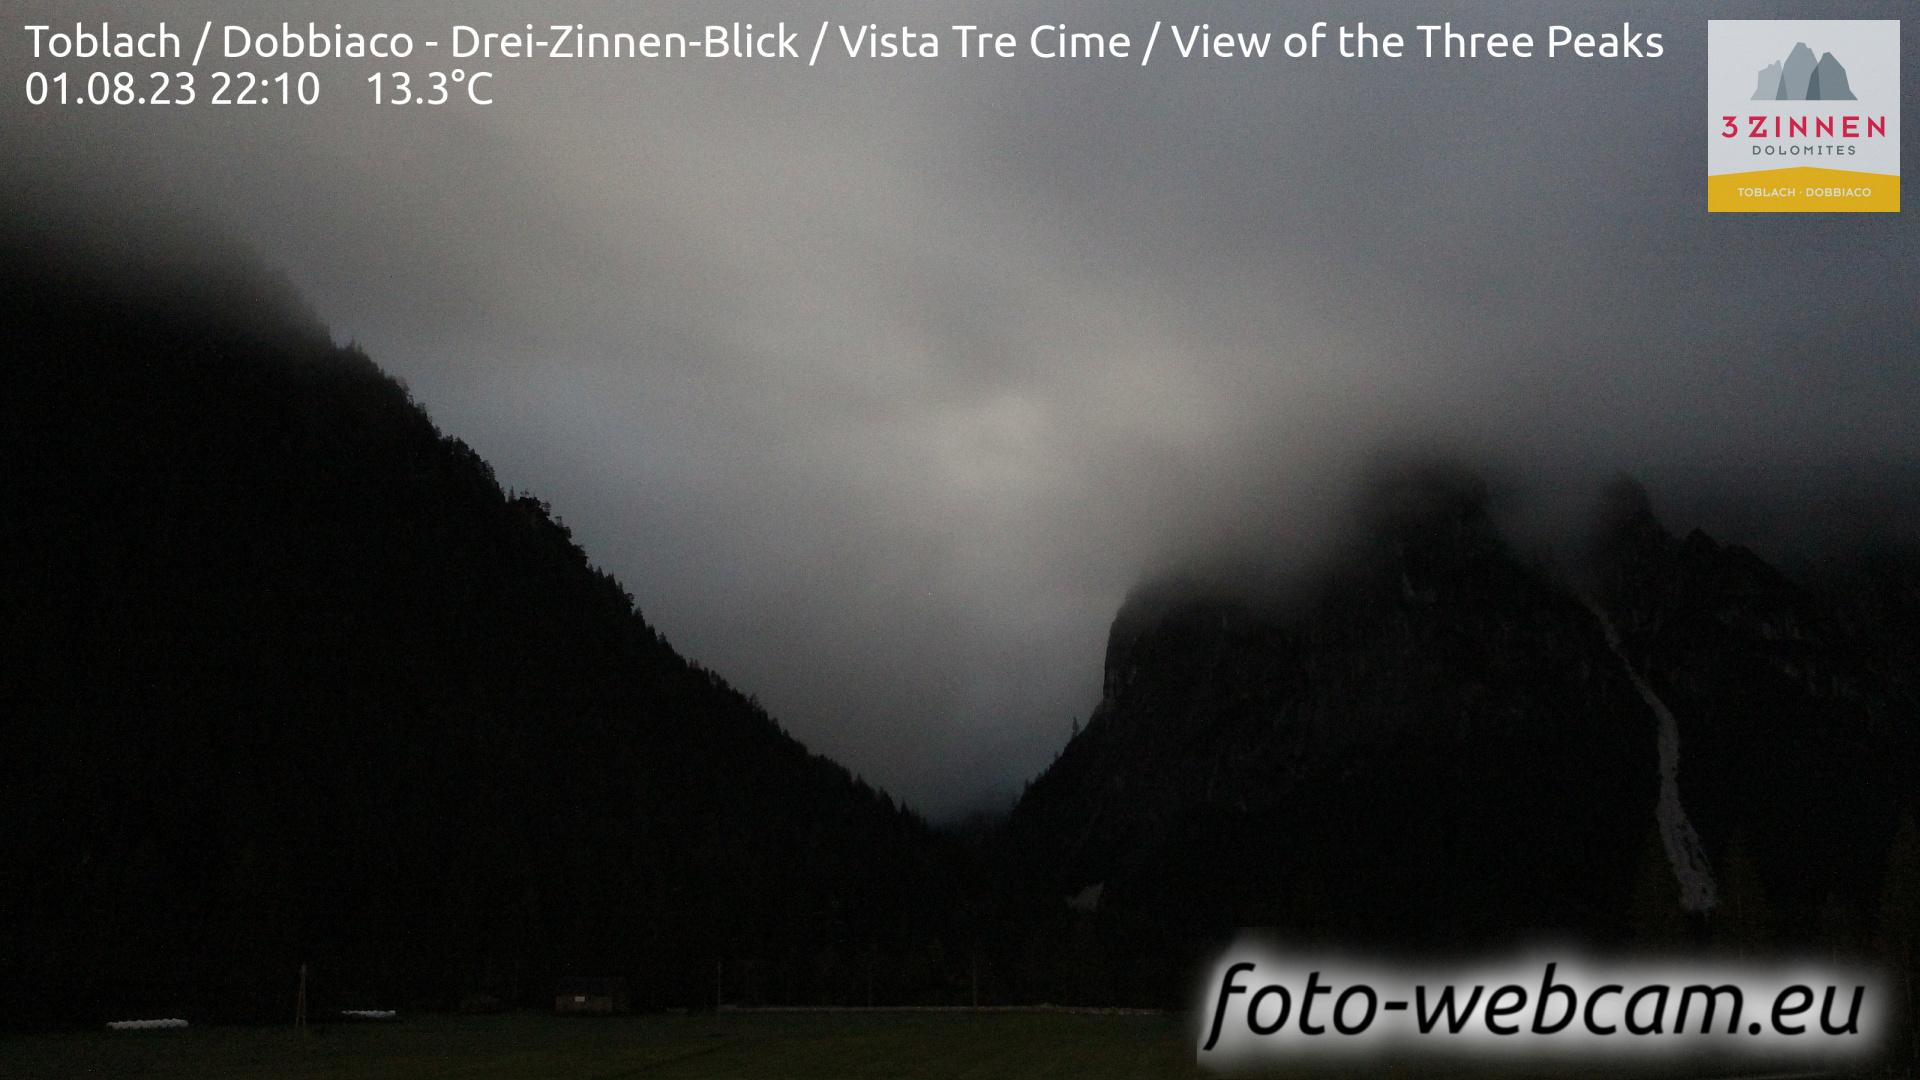 Toblach (Dolomiten) Mi. 22:27